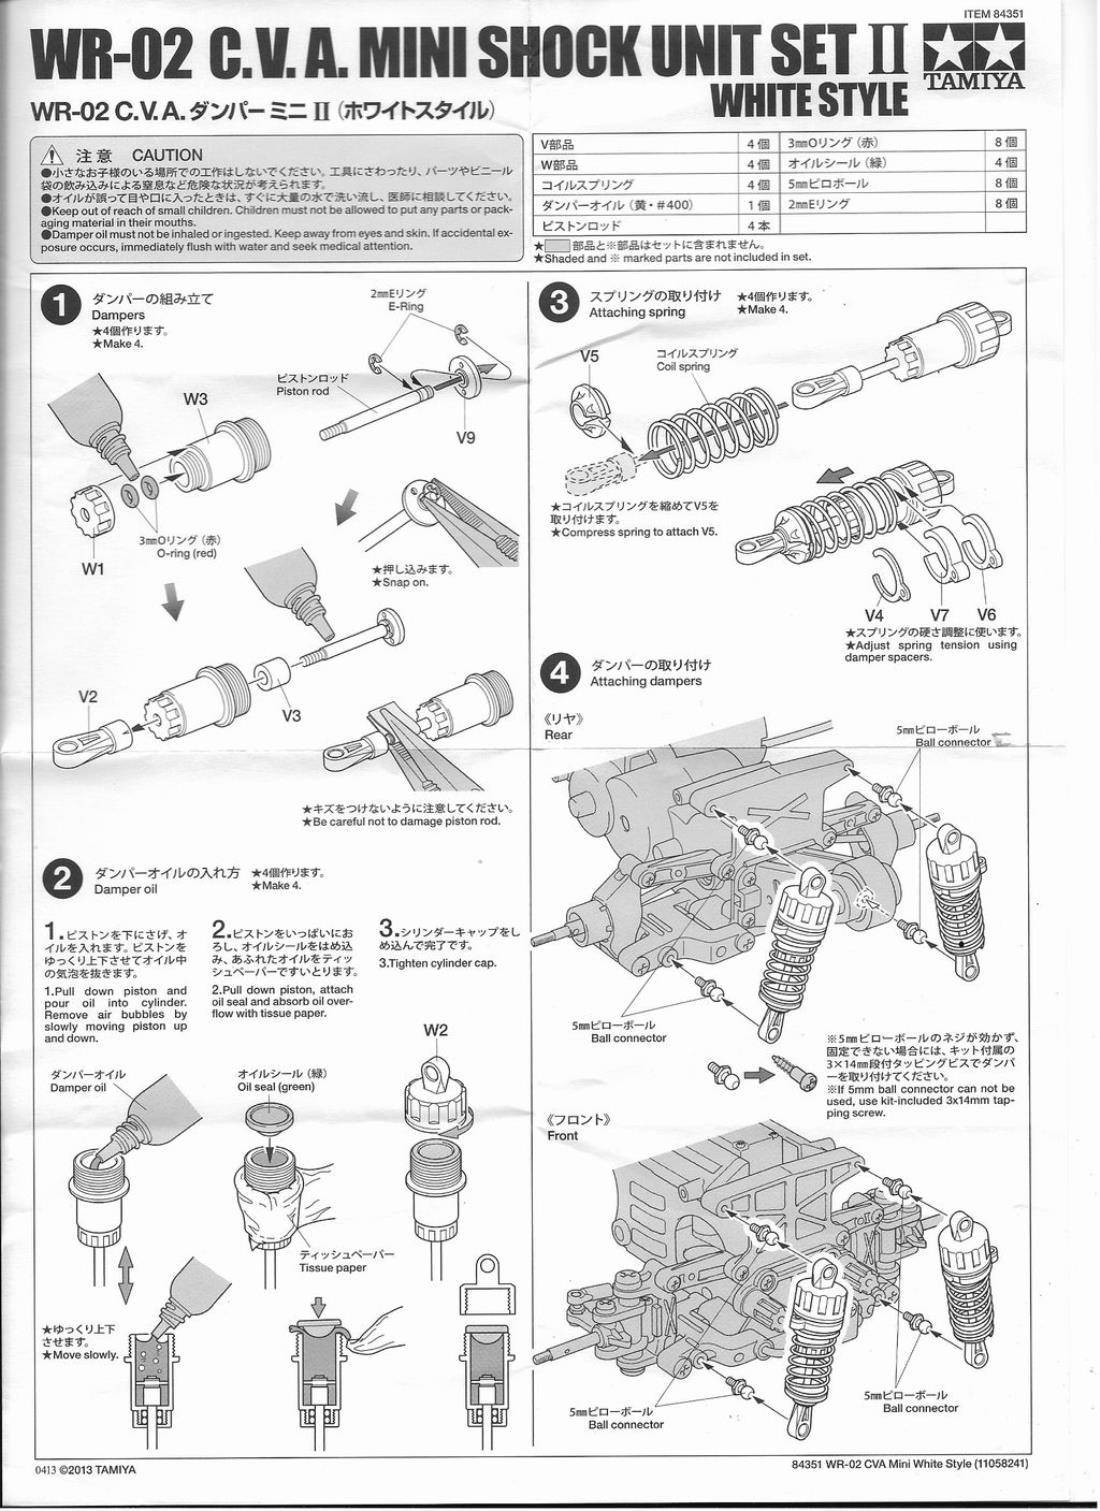 99999: Misc. from taffer showroom, Damper instructions